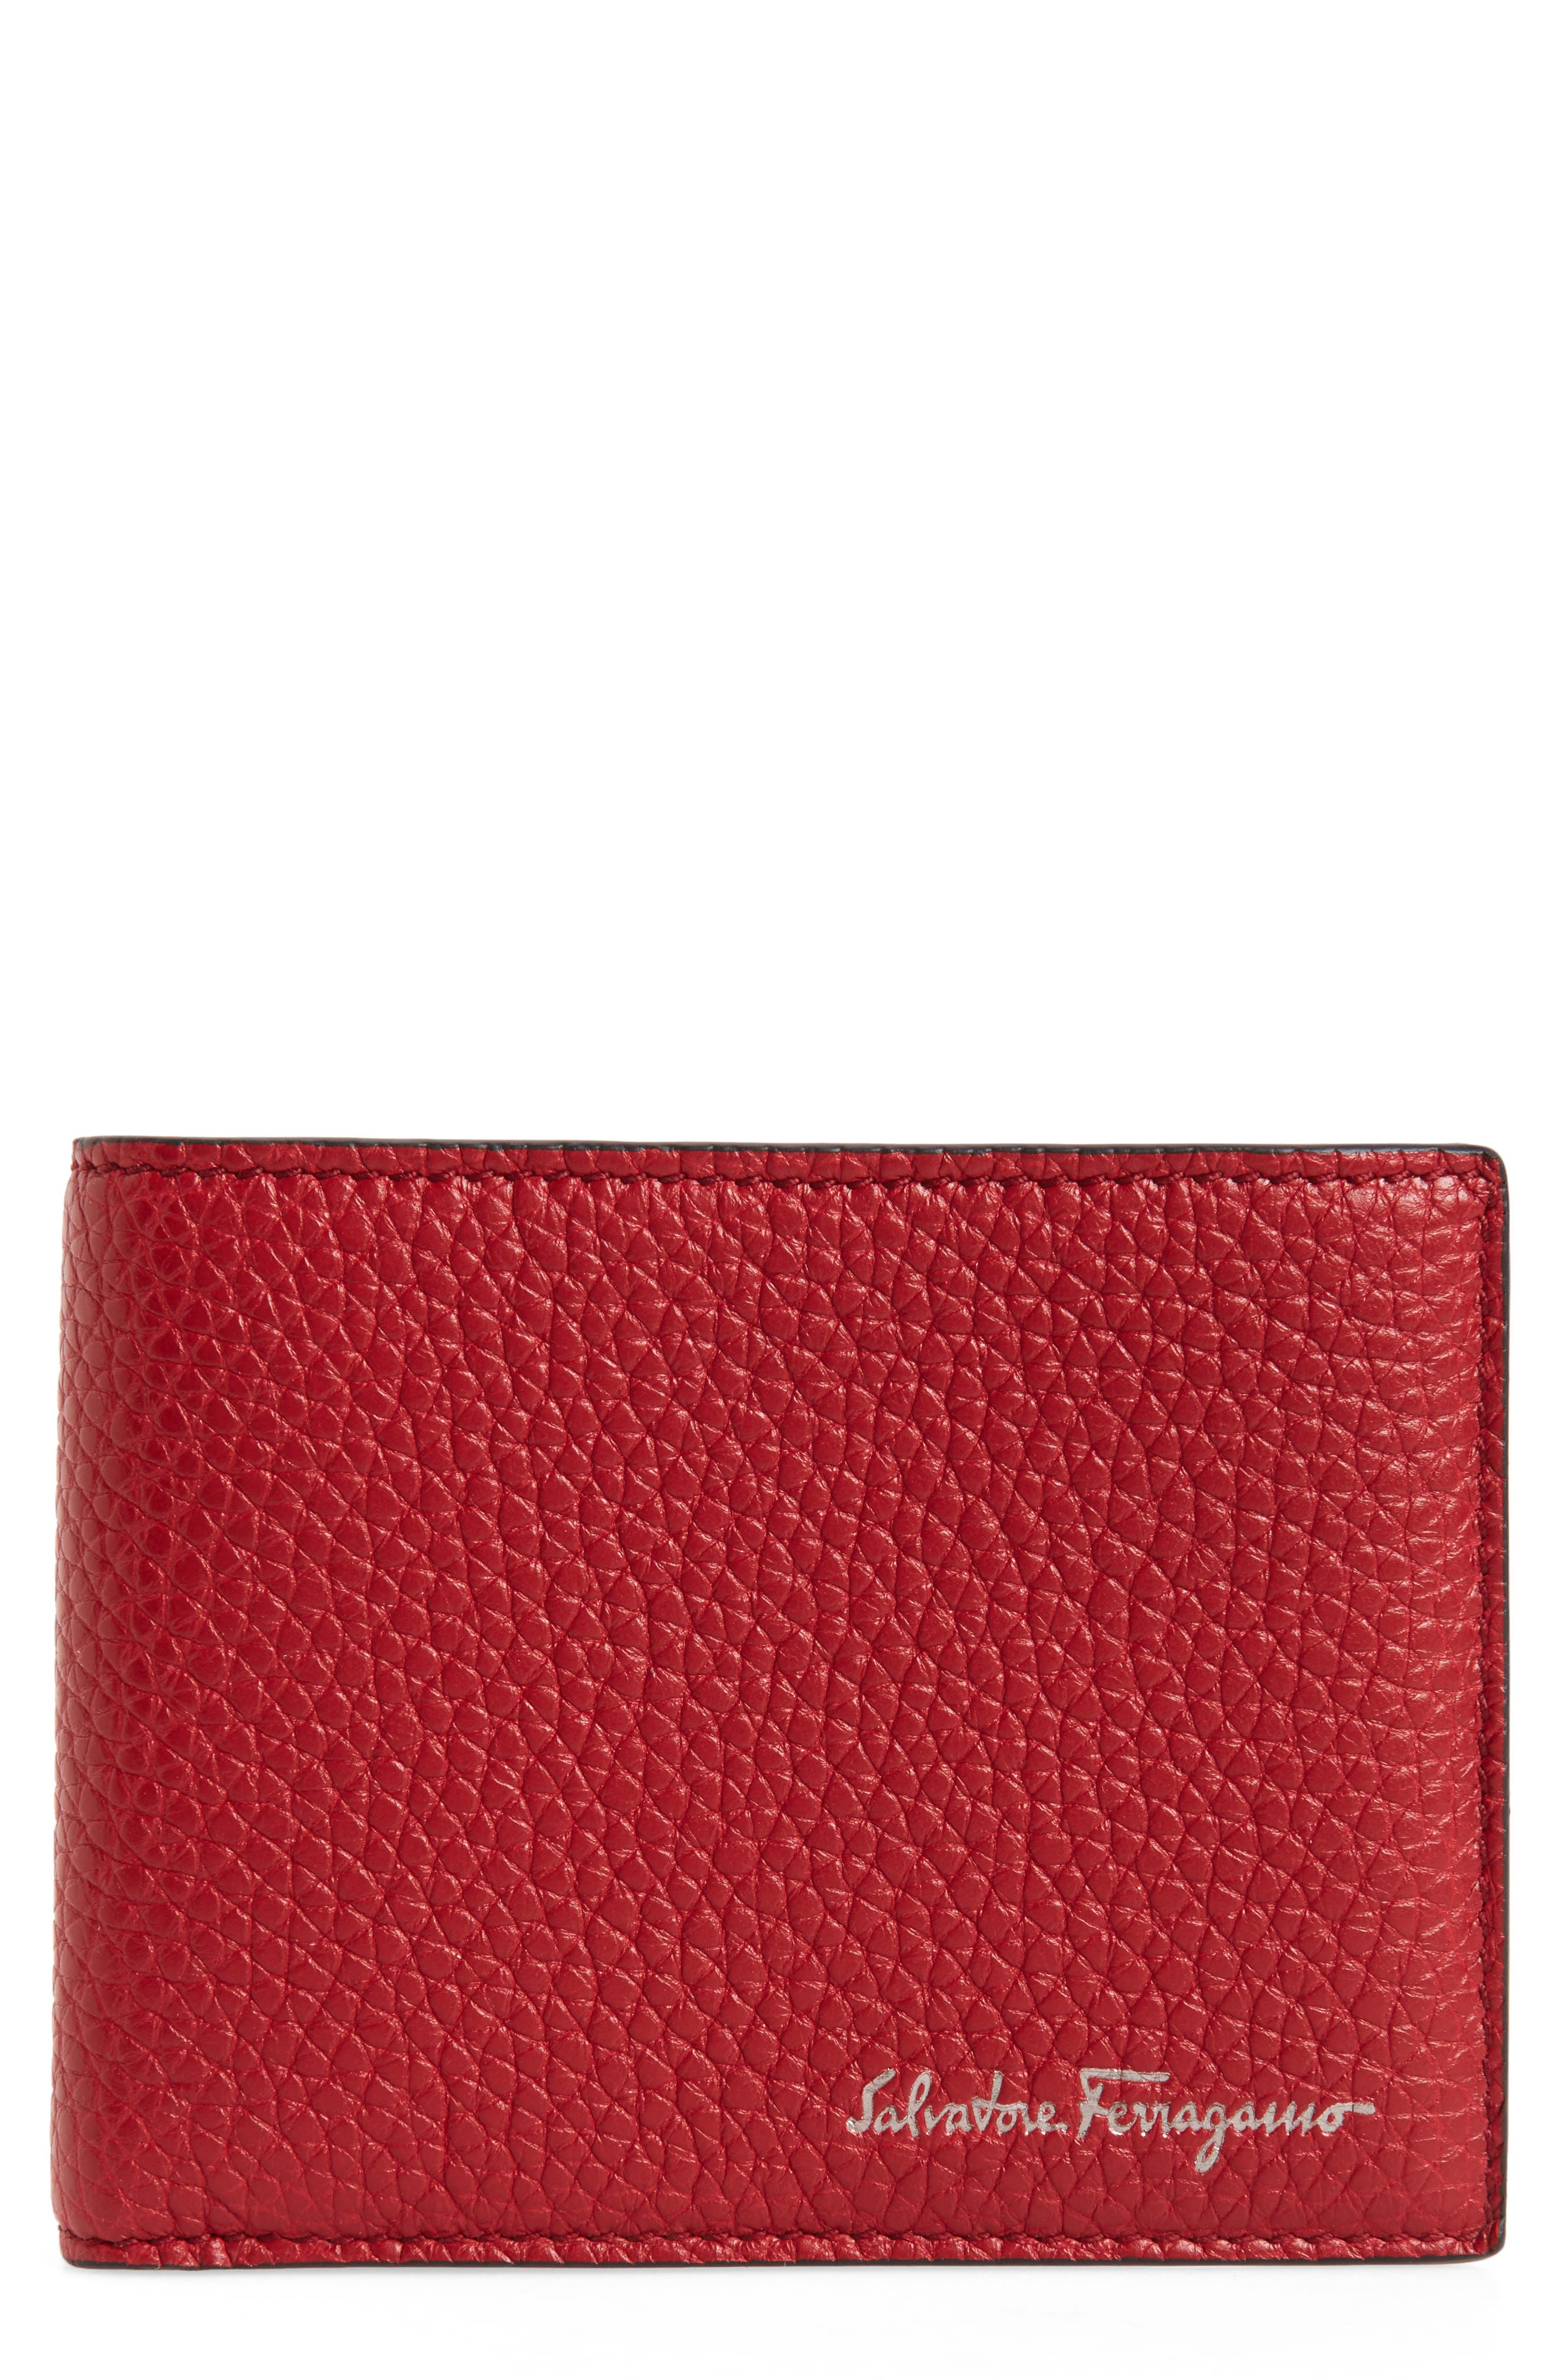 Salvatore Ferragamo Firenze Leather Bifold Wallet